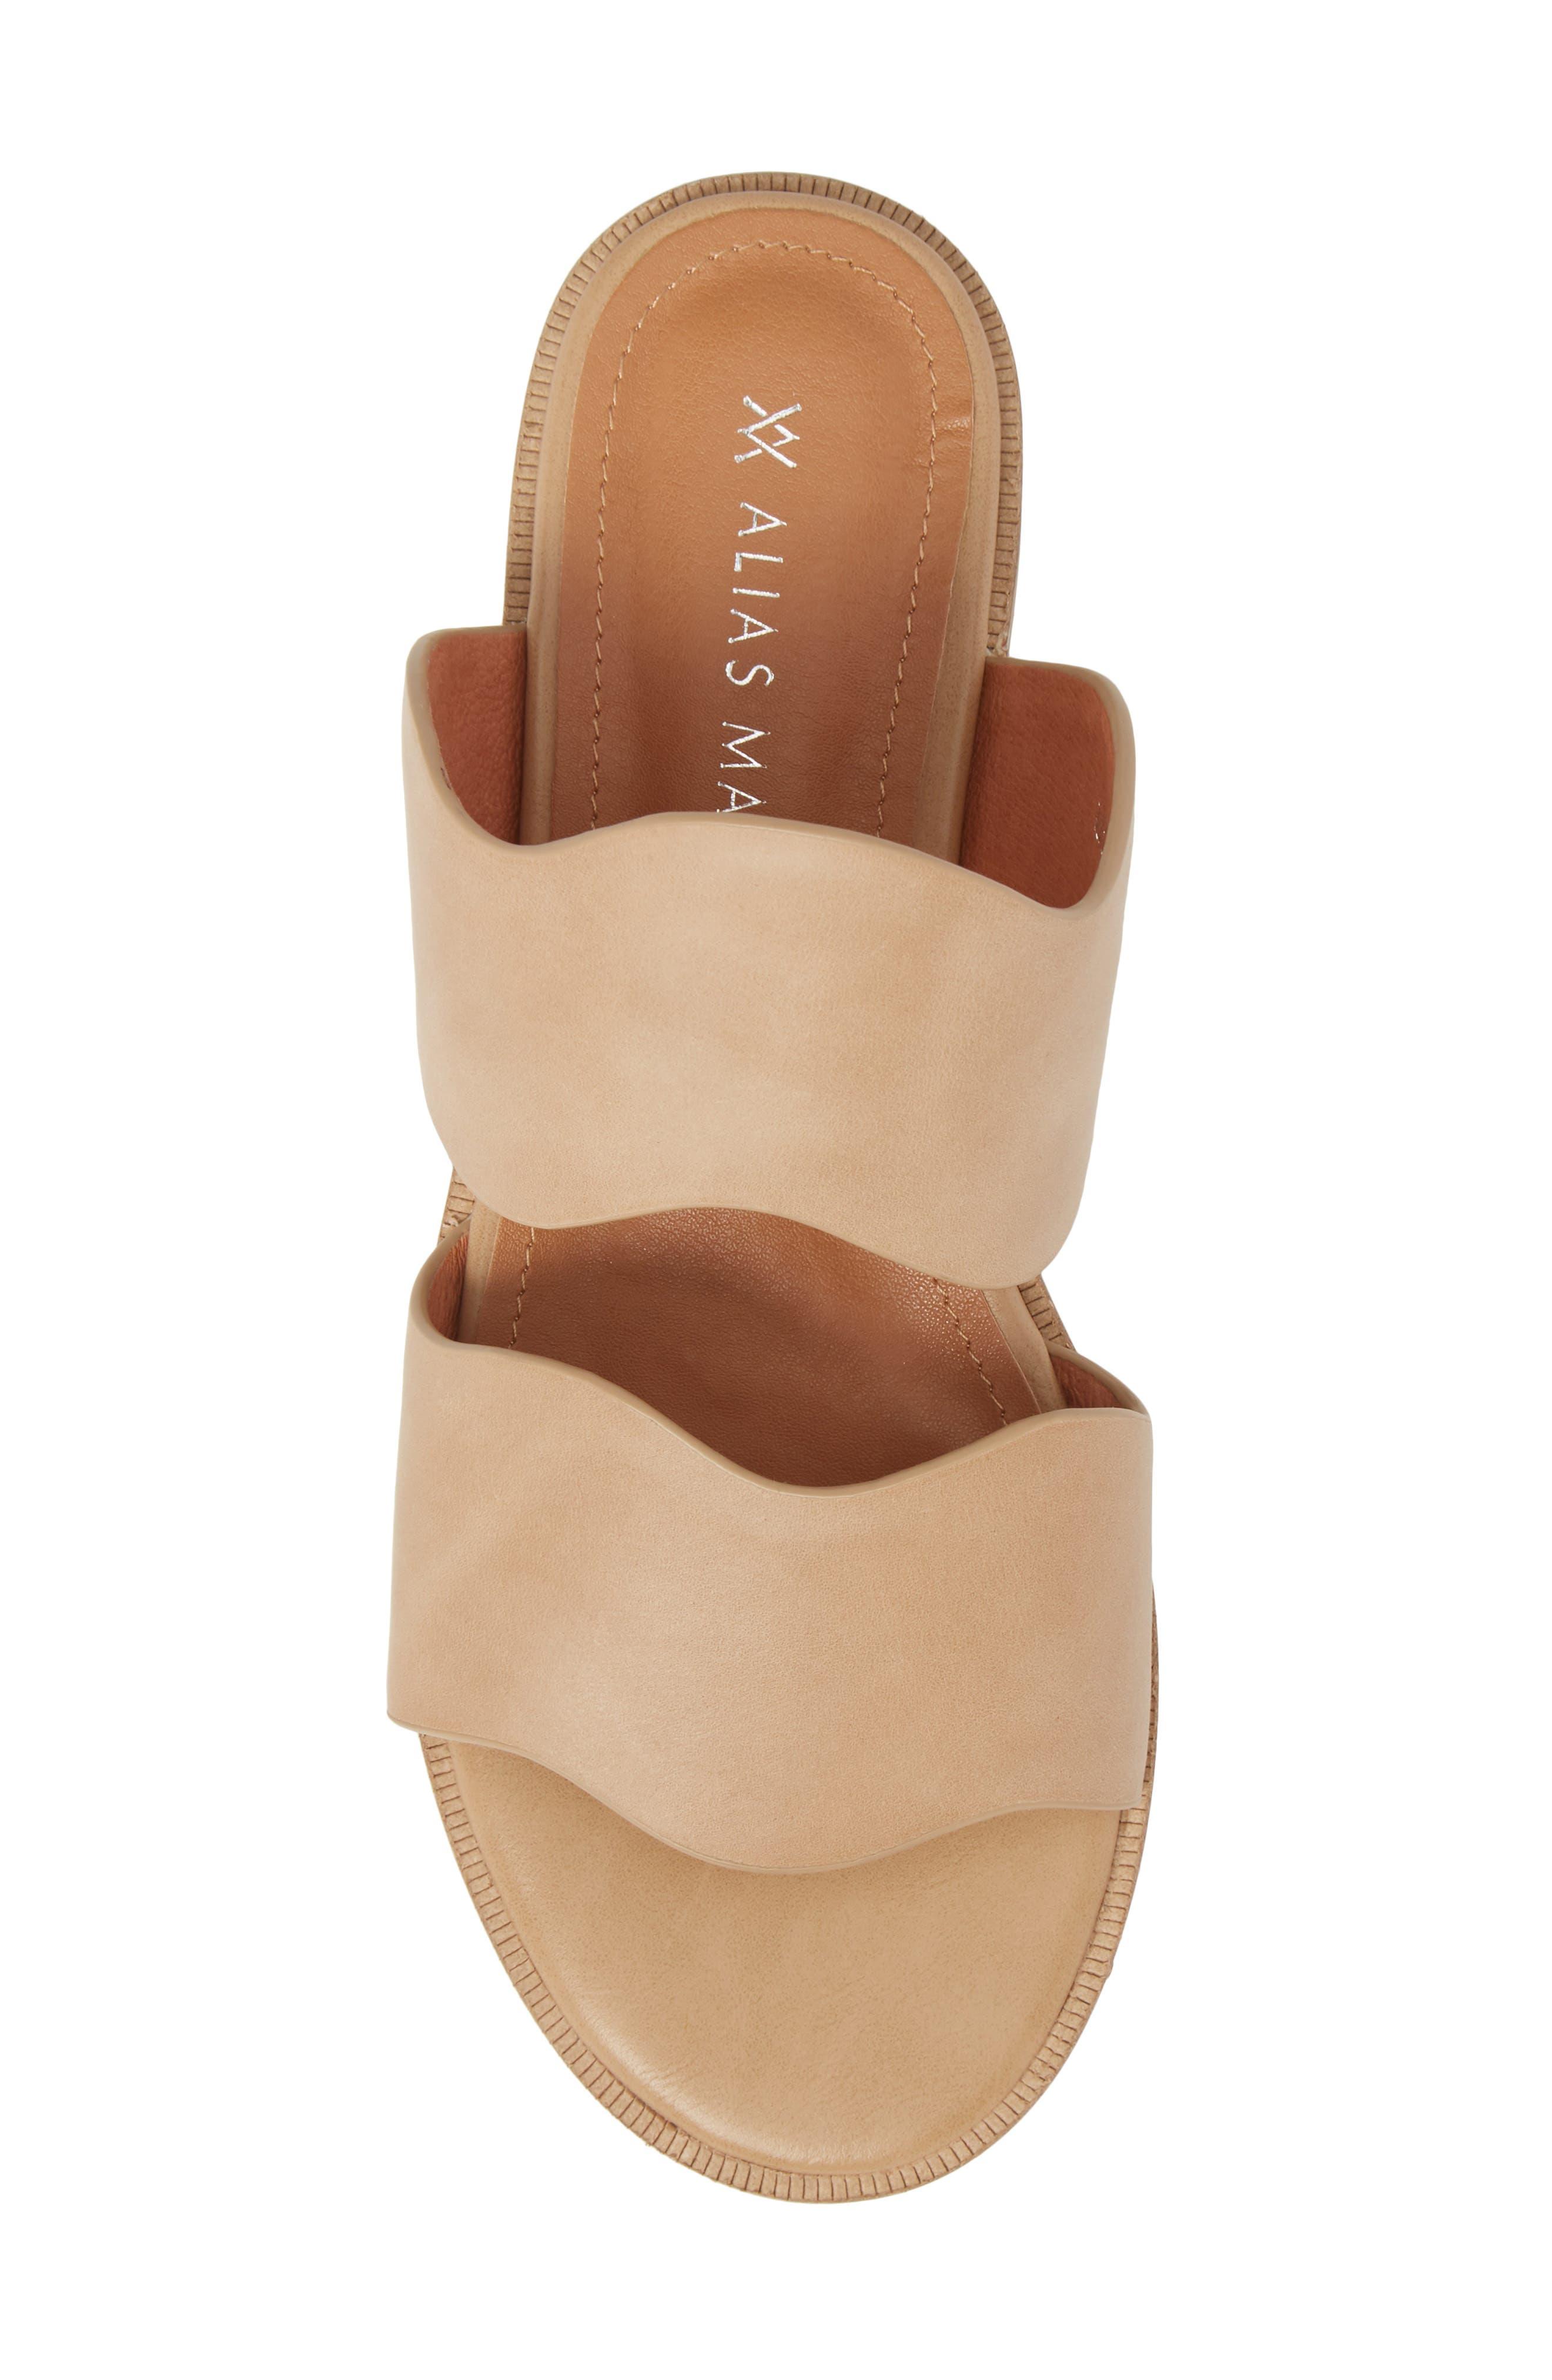 Thermos Scalloped Slide Sandal,                             Alternate thumbnail 5, color,                             250